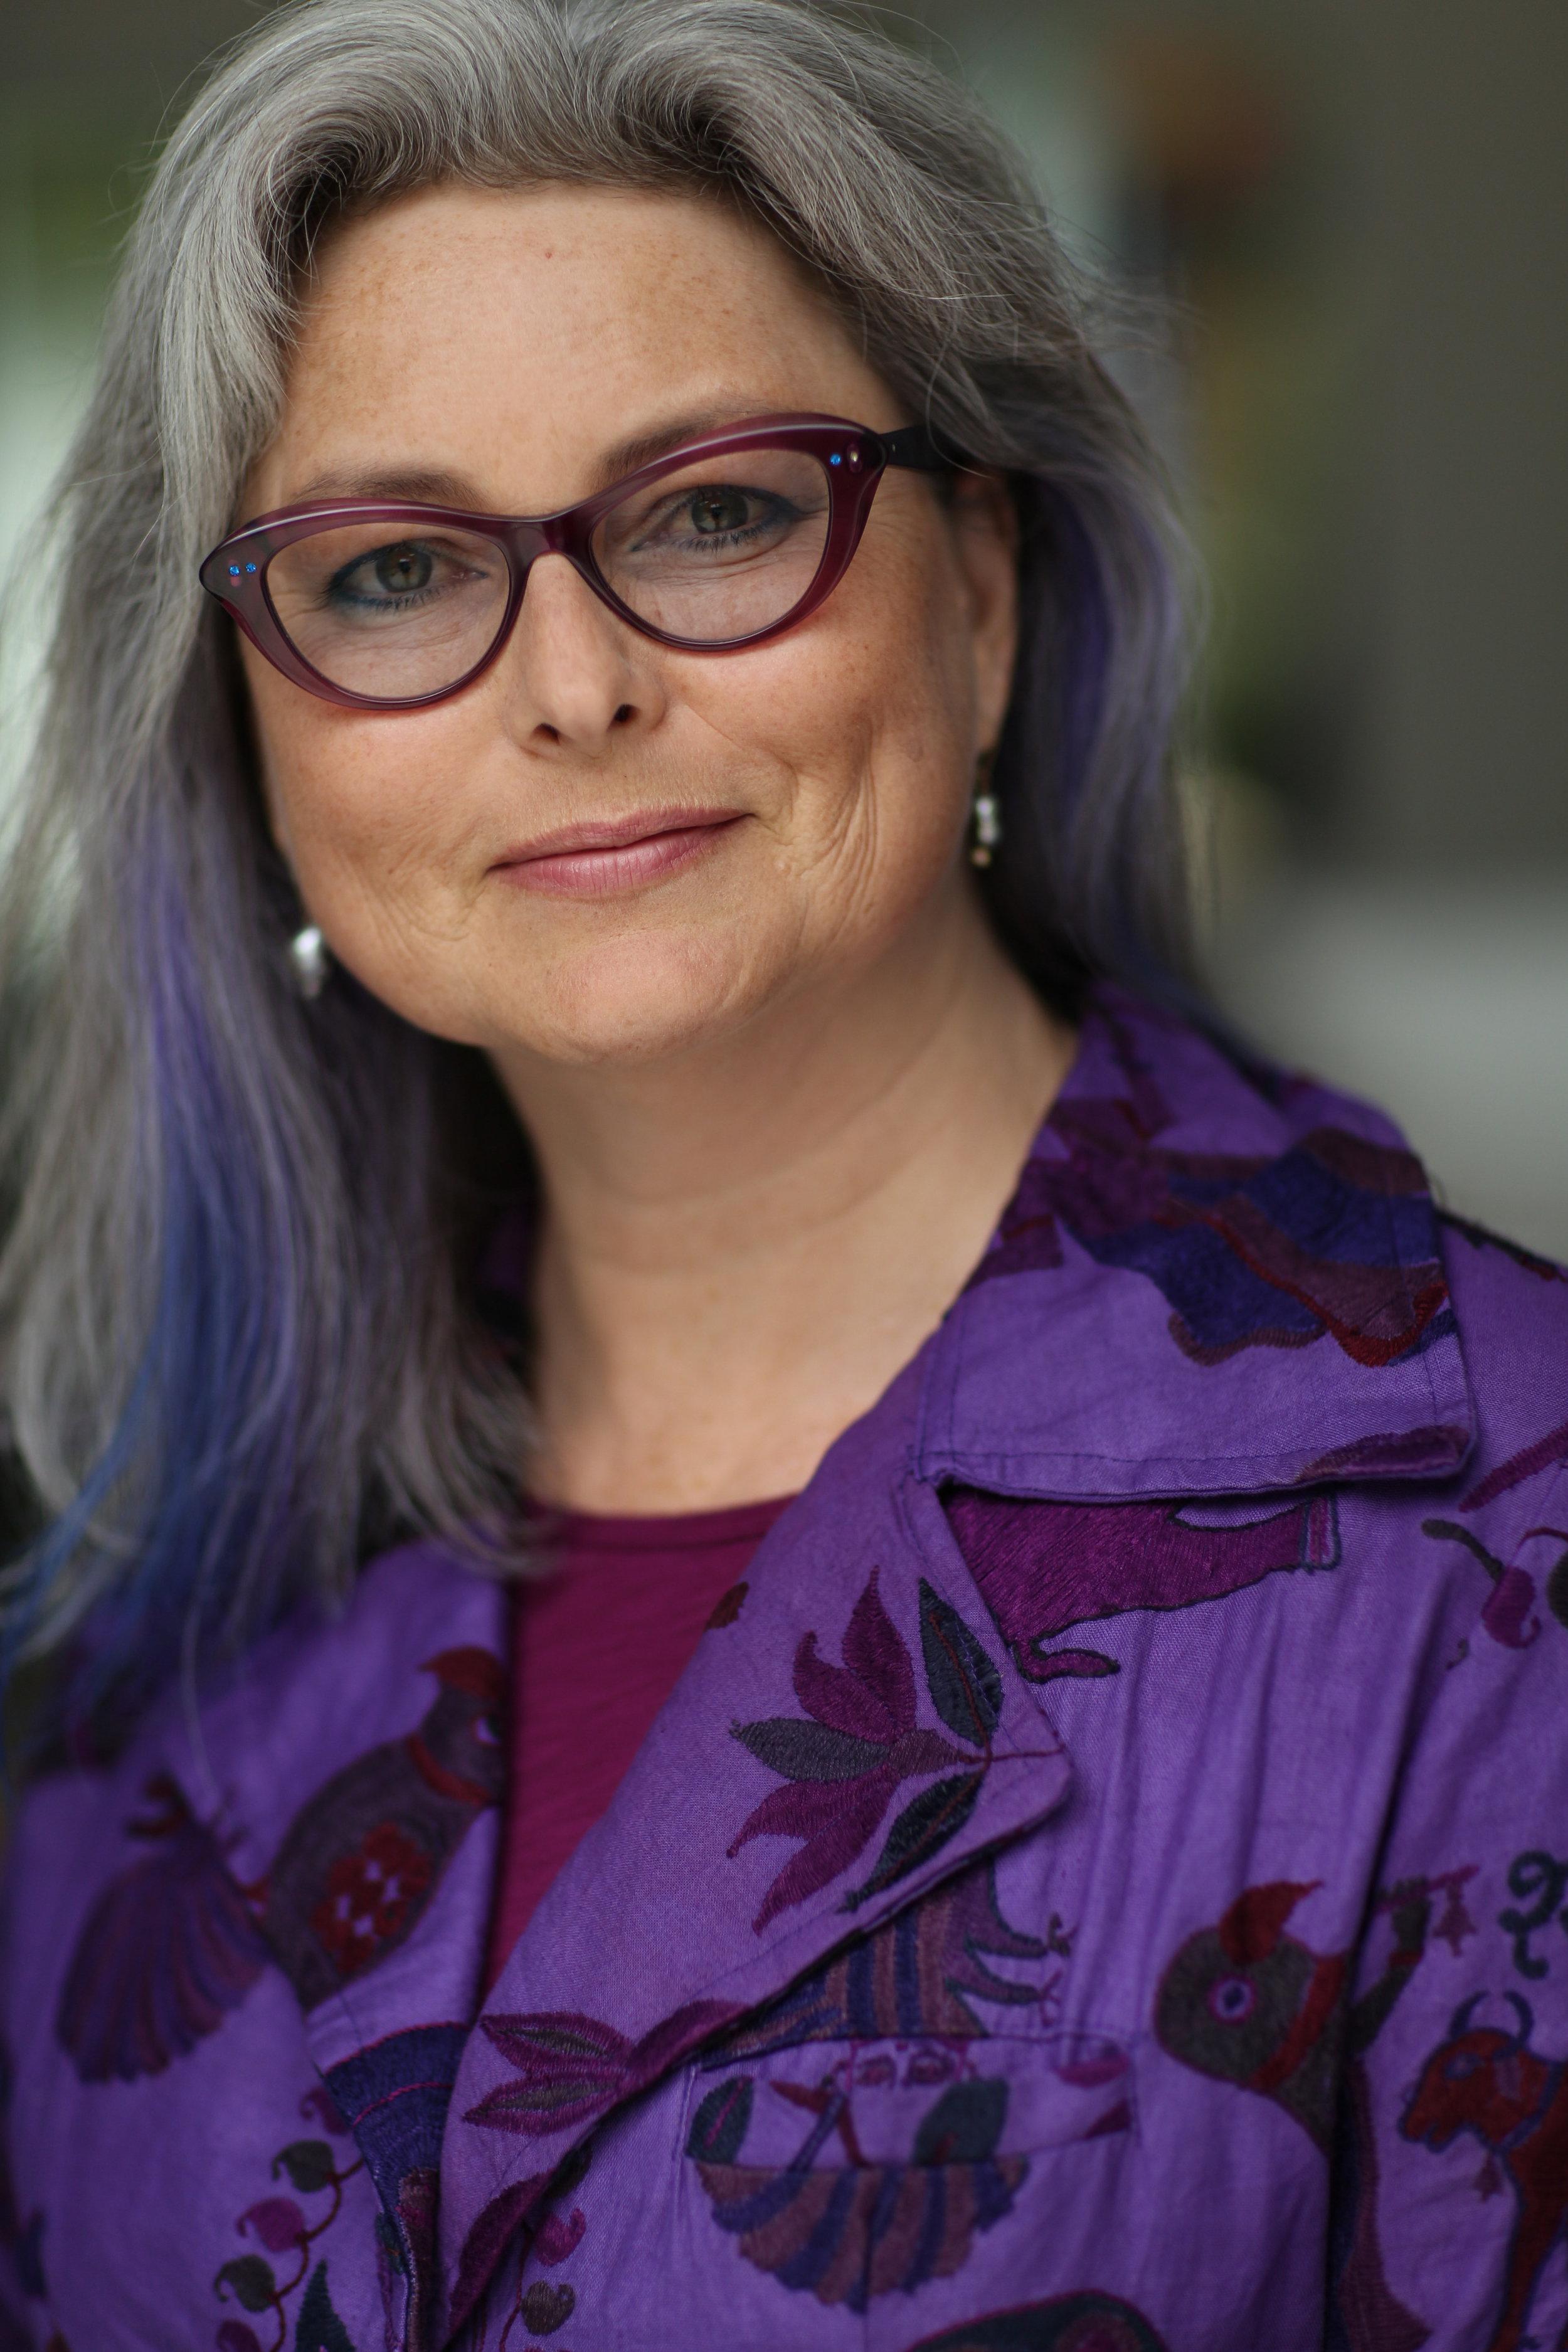 Laura Morton  , APLD  Laura Morton Design , Los Angeles, CA APLD Greater Los Angeles District Member & CA Chapter Sponsorship Chair